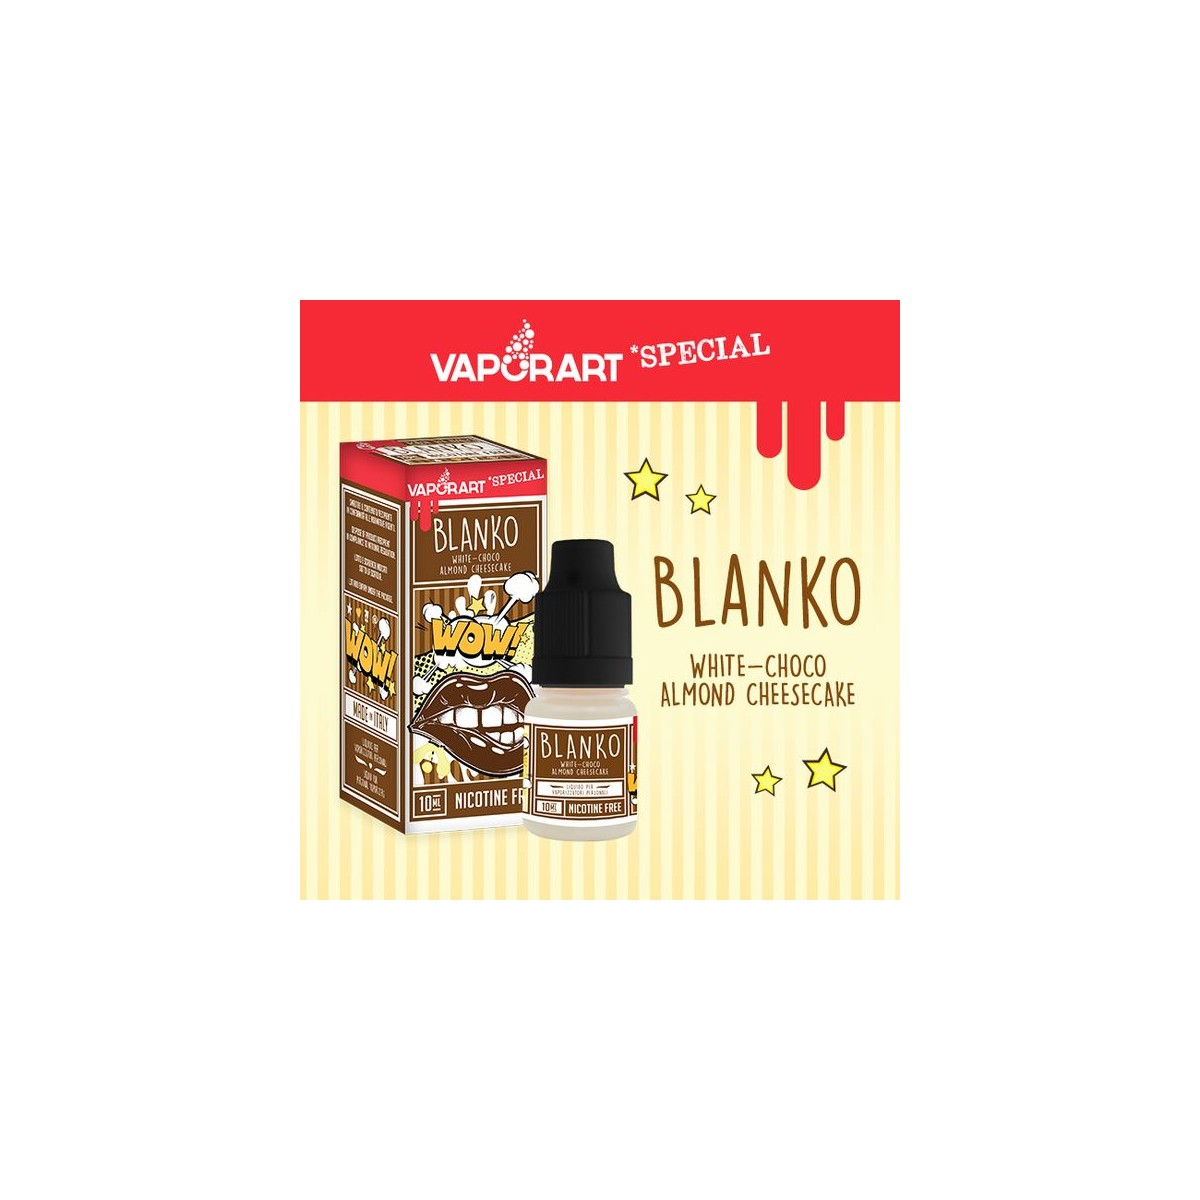 Vaporart 10ml - Special Edition - Blanko-8mg/ml